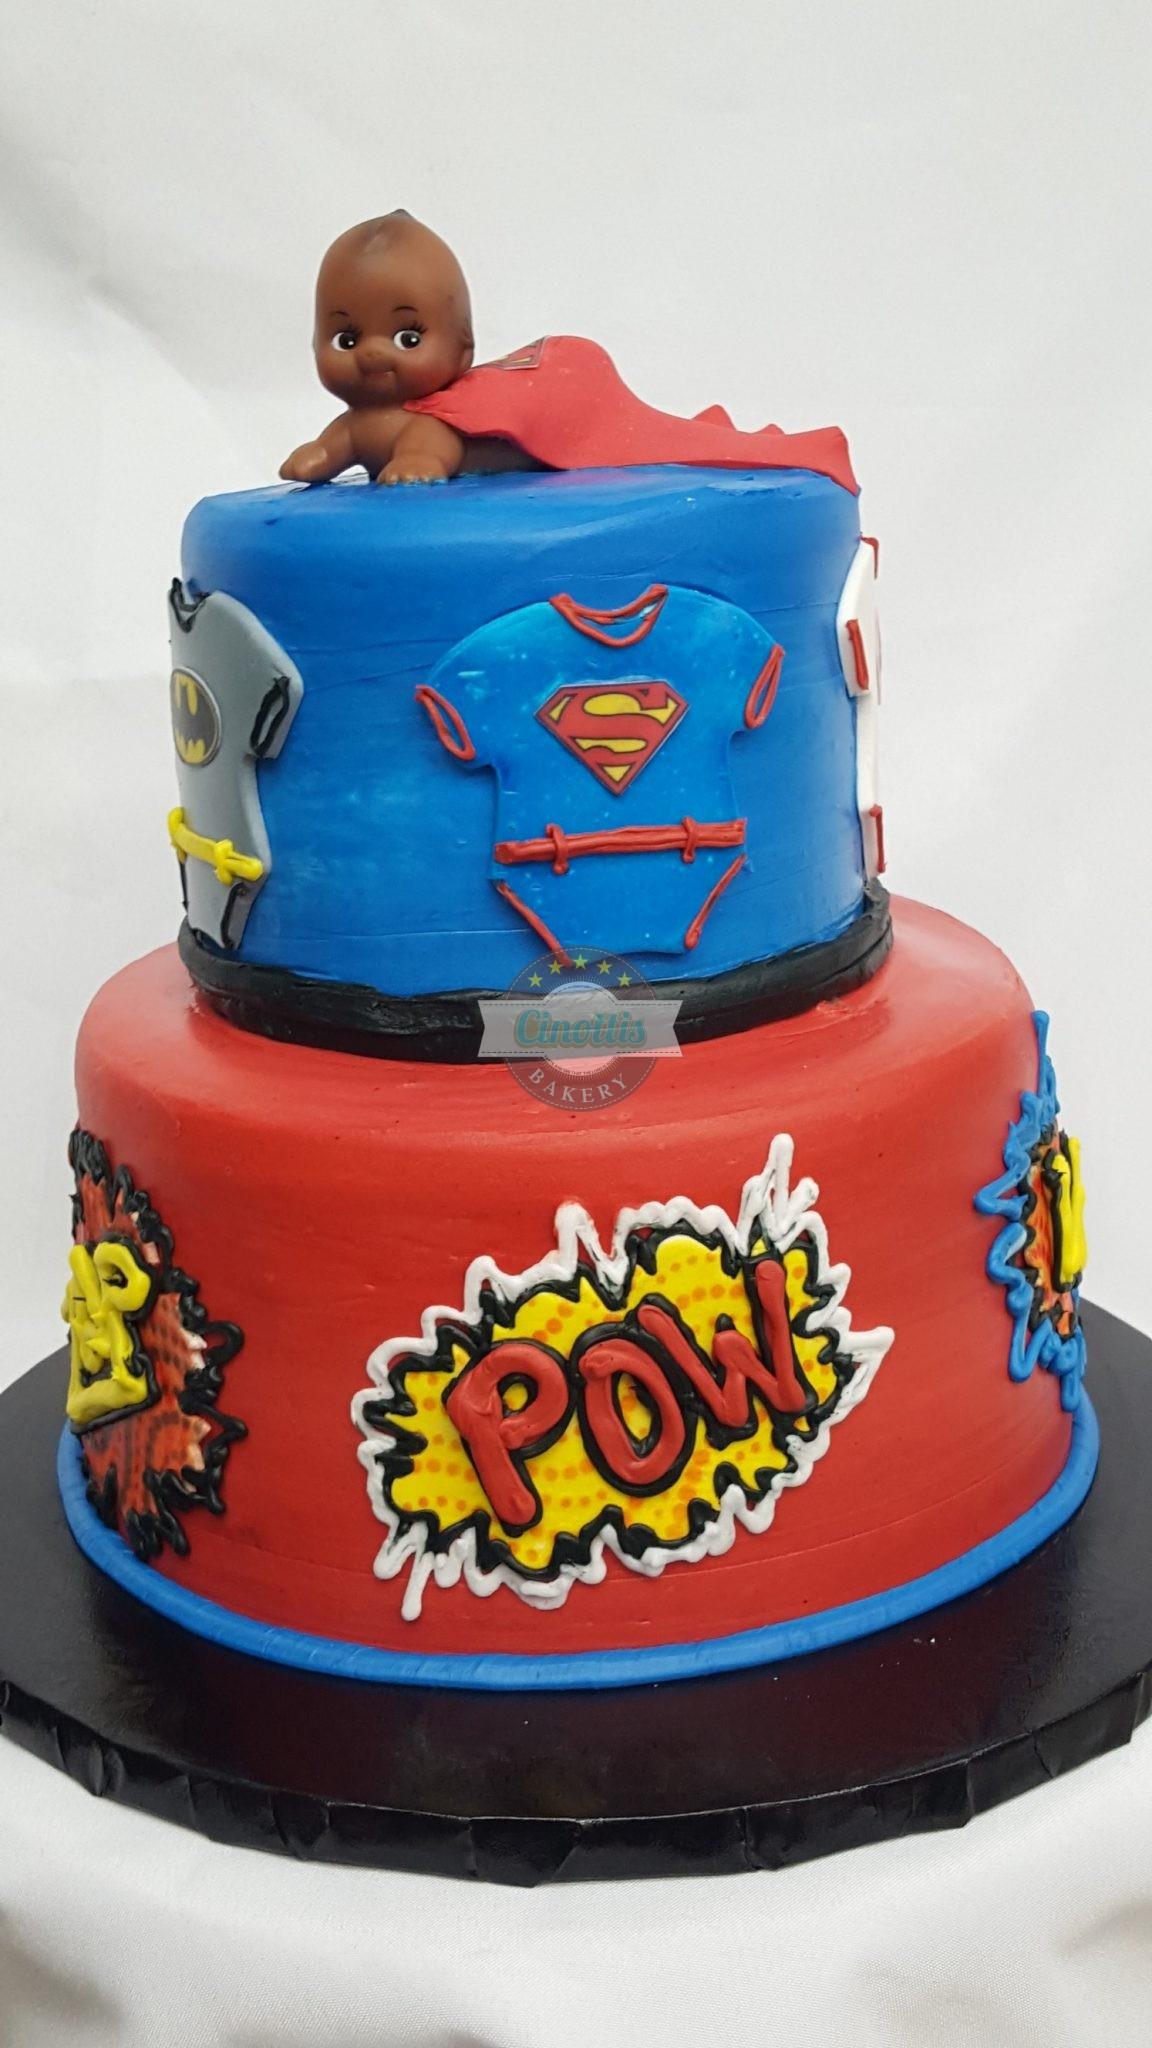 Comic Book Baby A Superhero Baby Cake From Cinottis Bakery